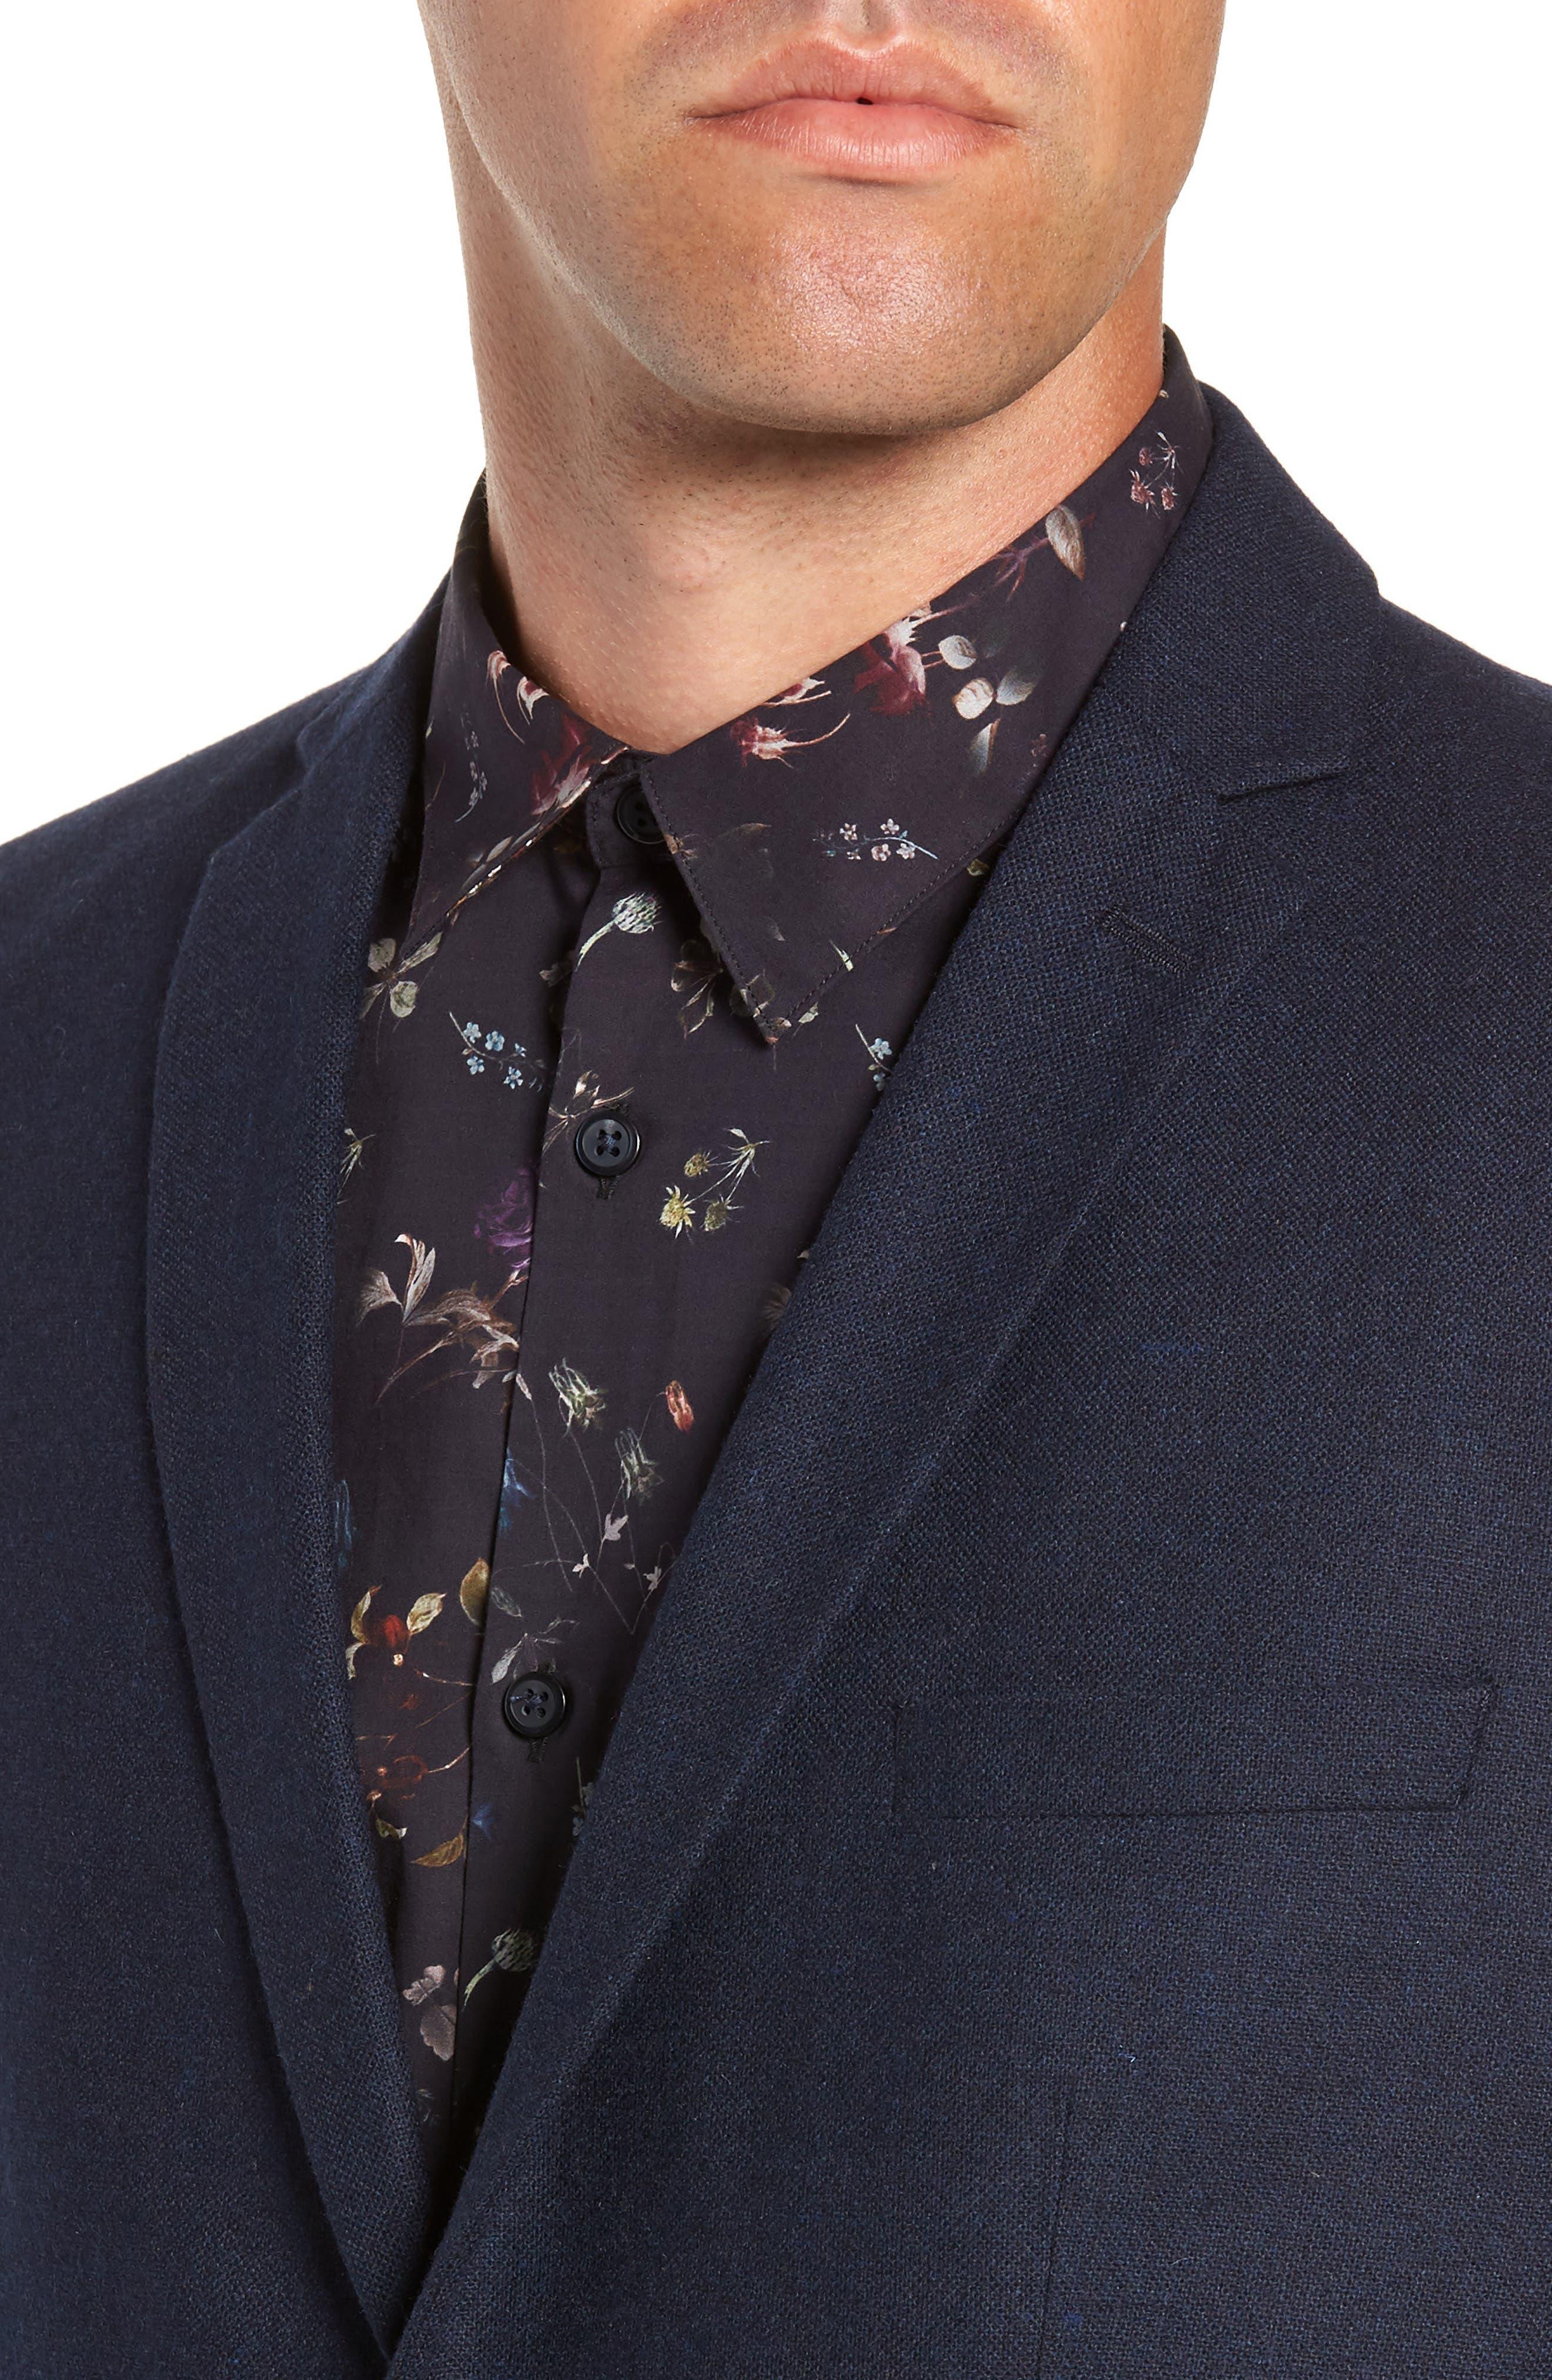 Myloiver Slim Fit Wool Blend Blazer,                             Alternate thumbnail 4, color,                             DARK NAVY